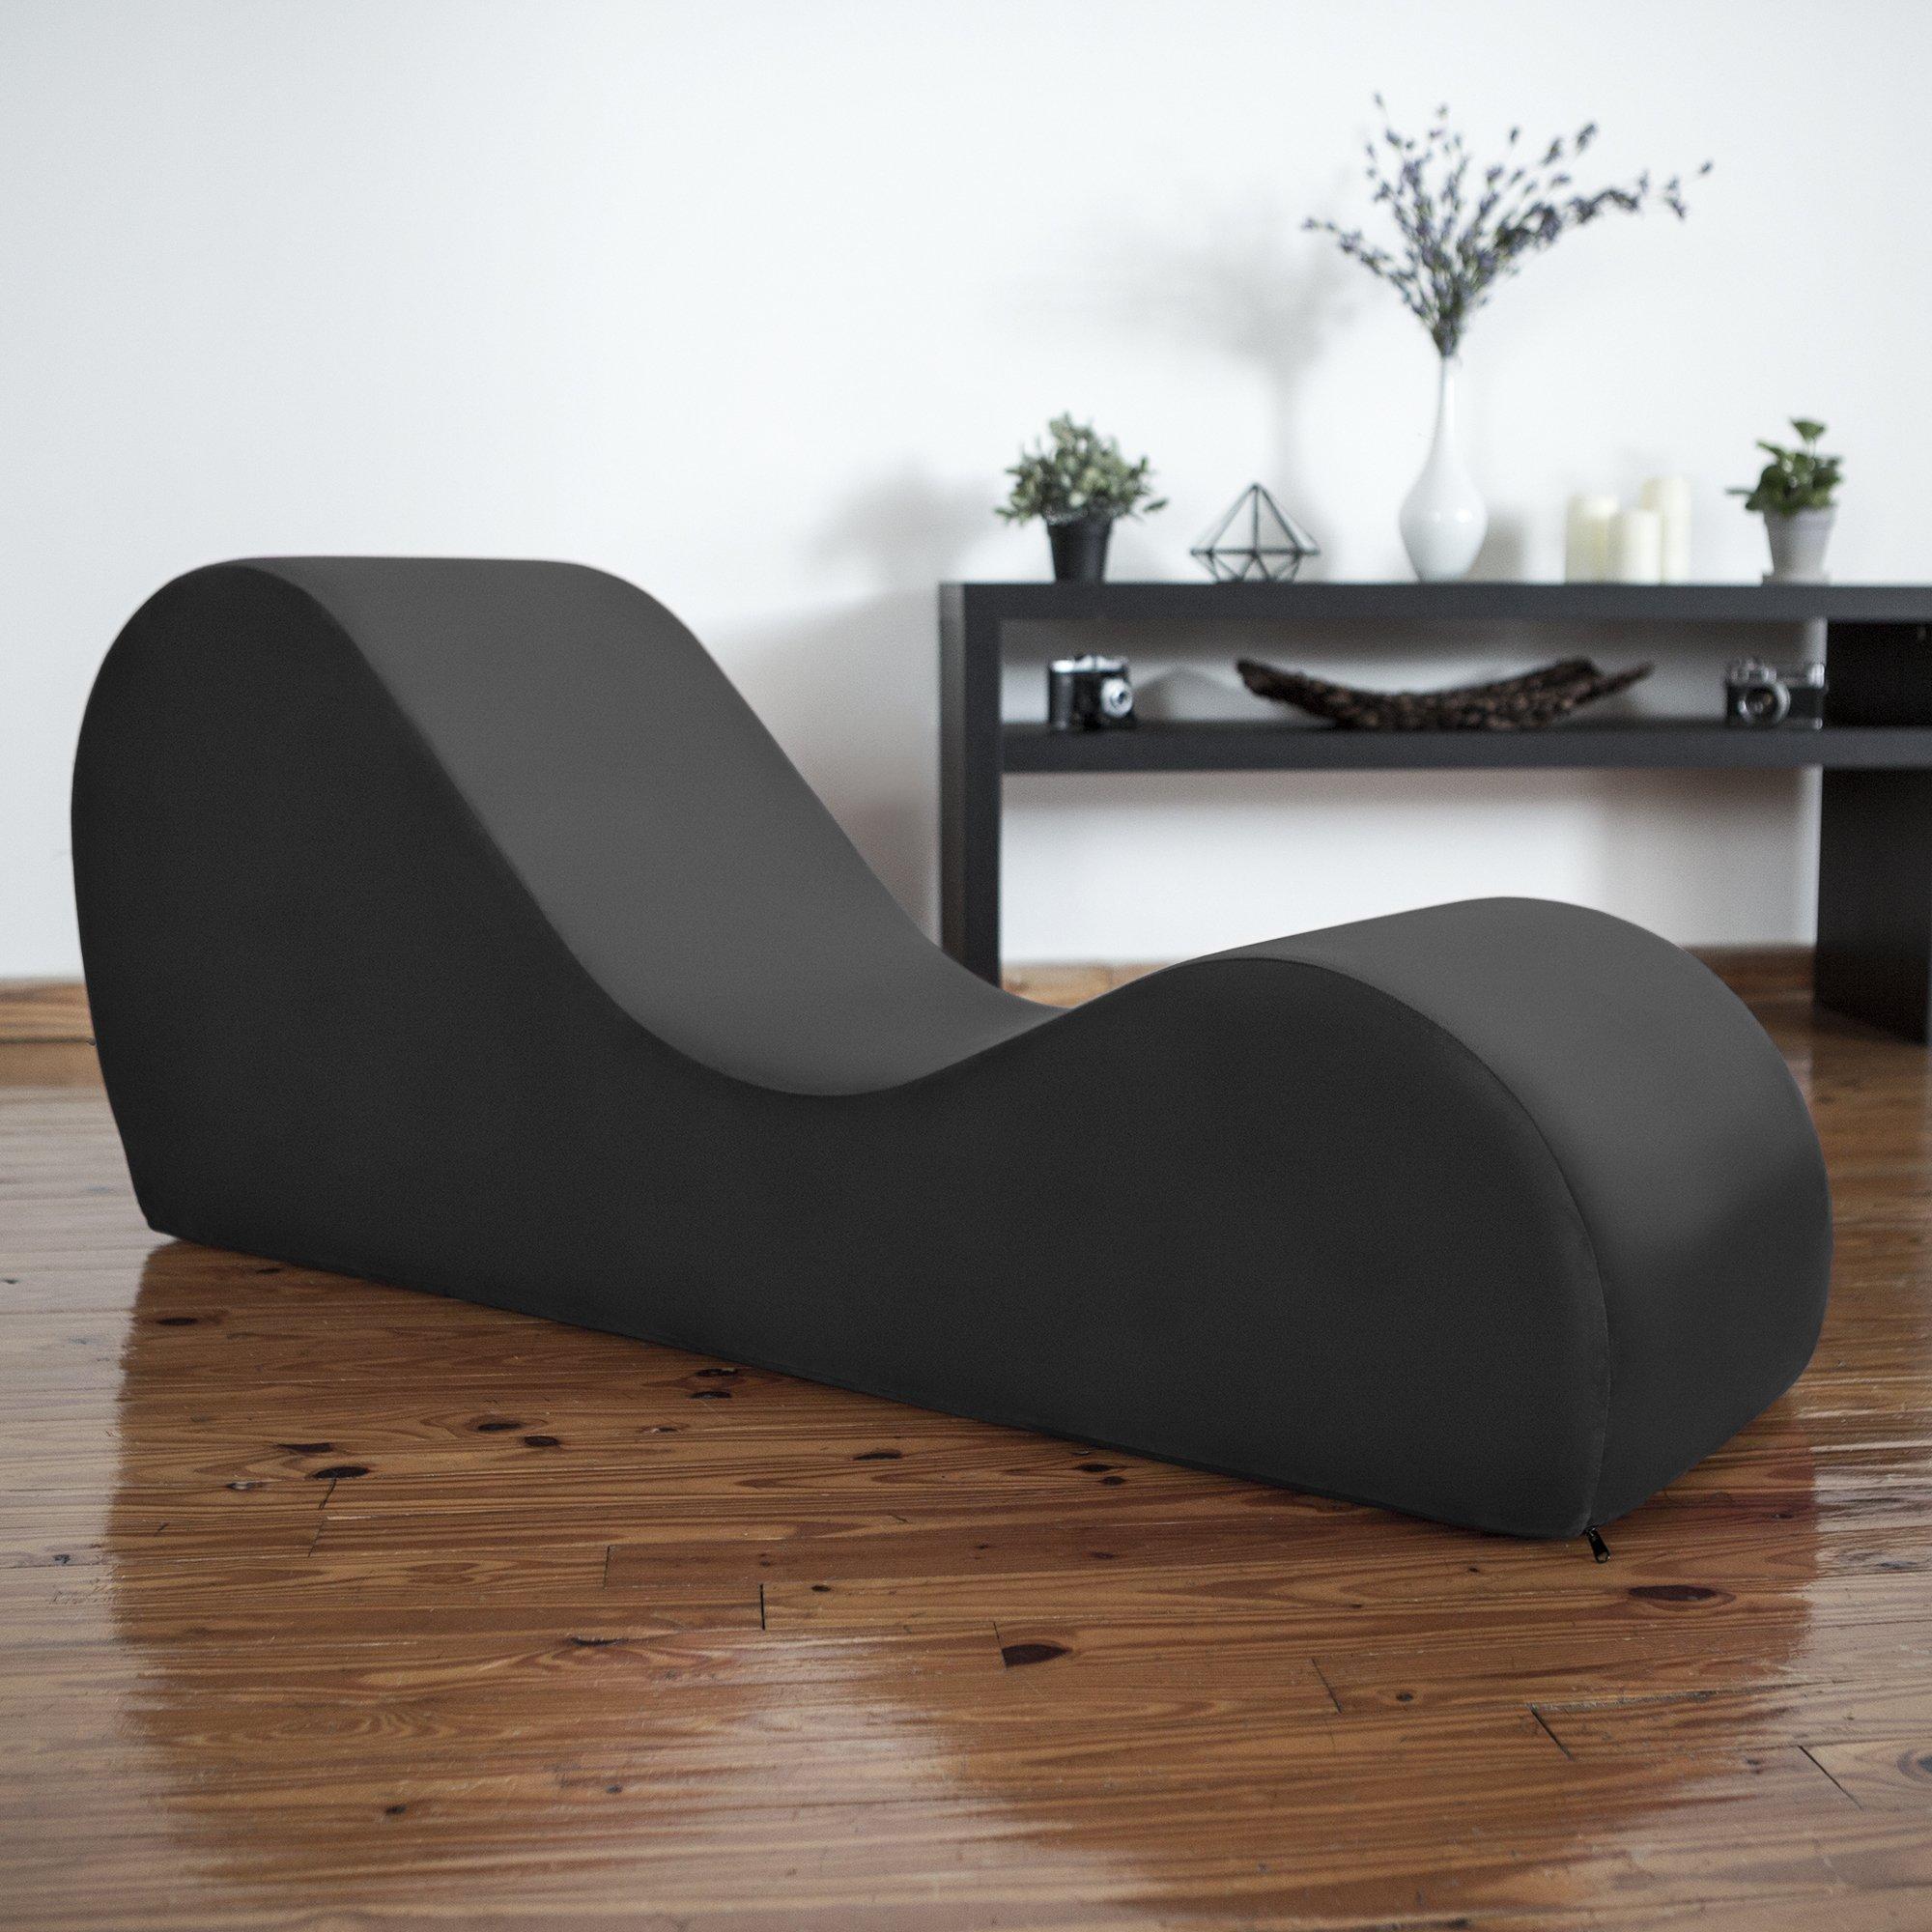 Liberator Kama Sutra Sex Chair Sensual Yoga Chaise - Black Micro-velvet by Liberator